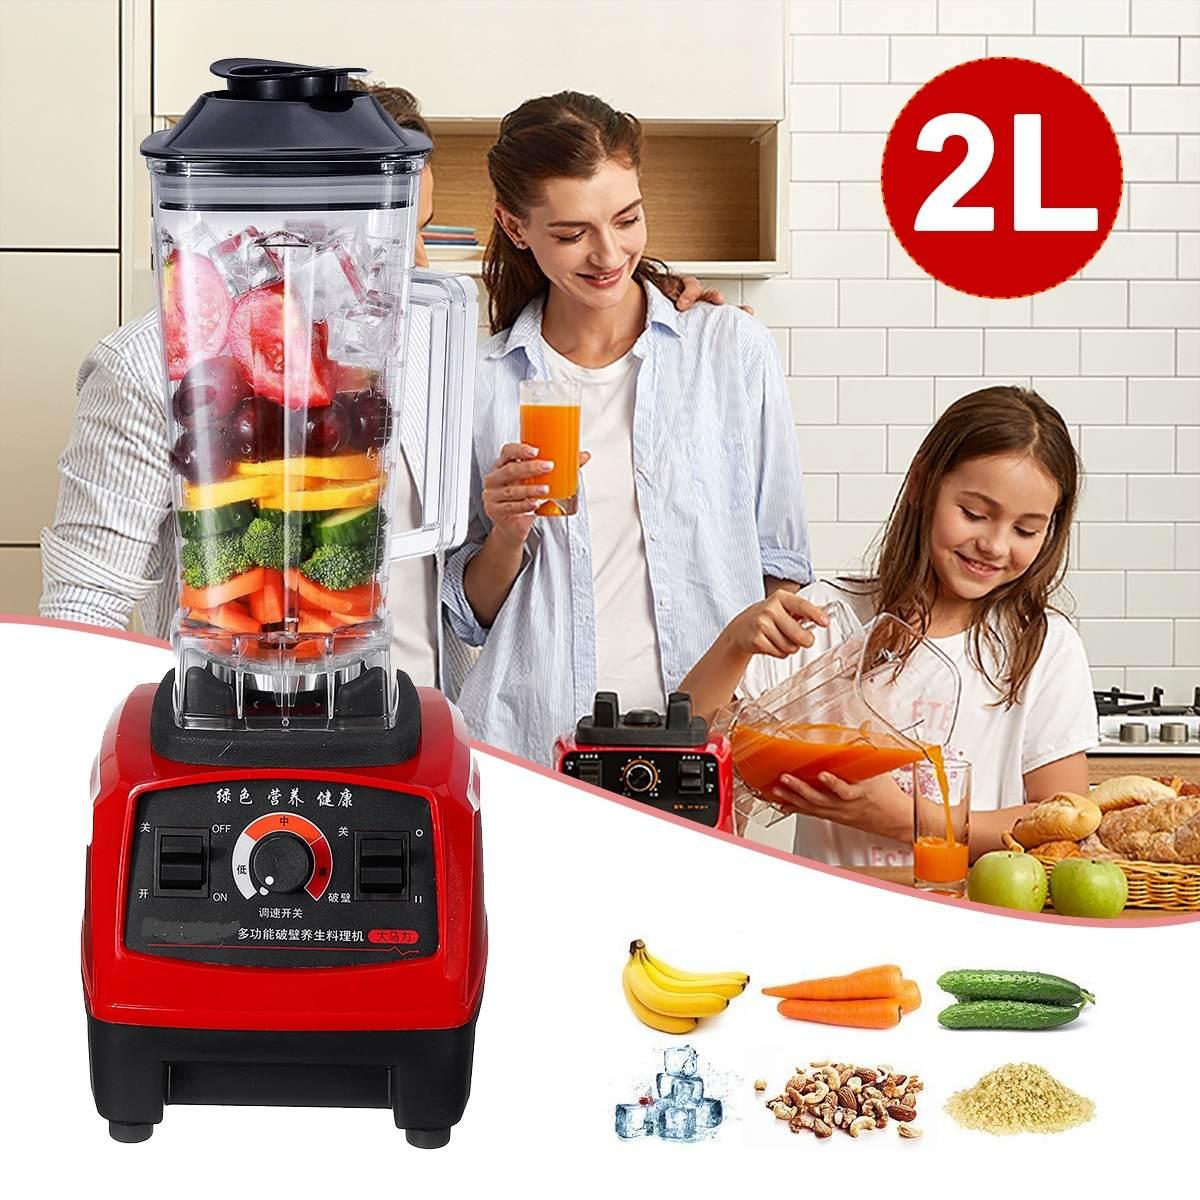 800W 2L Heavy Duty Commercial Blender Professional Blender Mixer Food Processor Japan Blade Juicer Ice Smoothie Machine